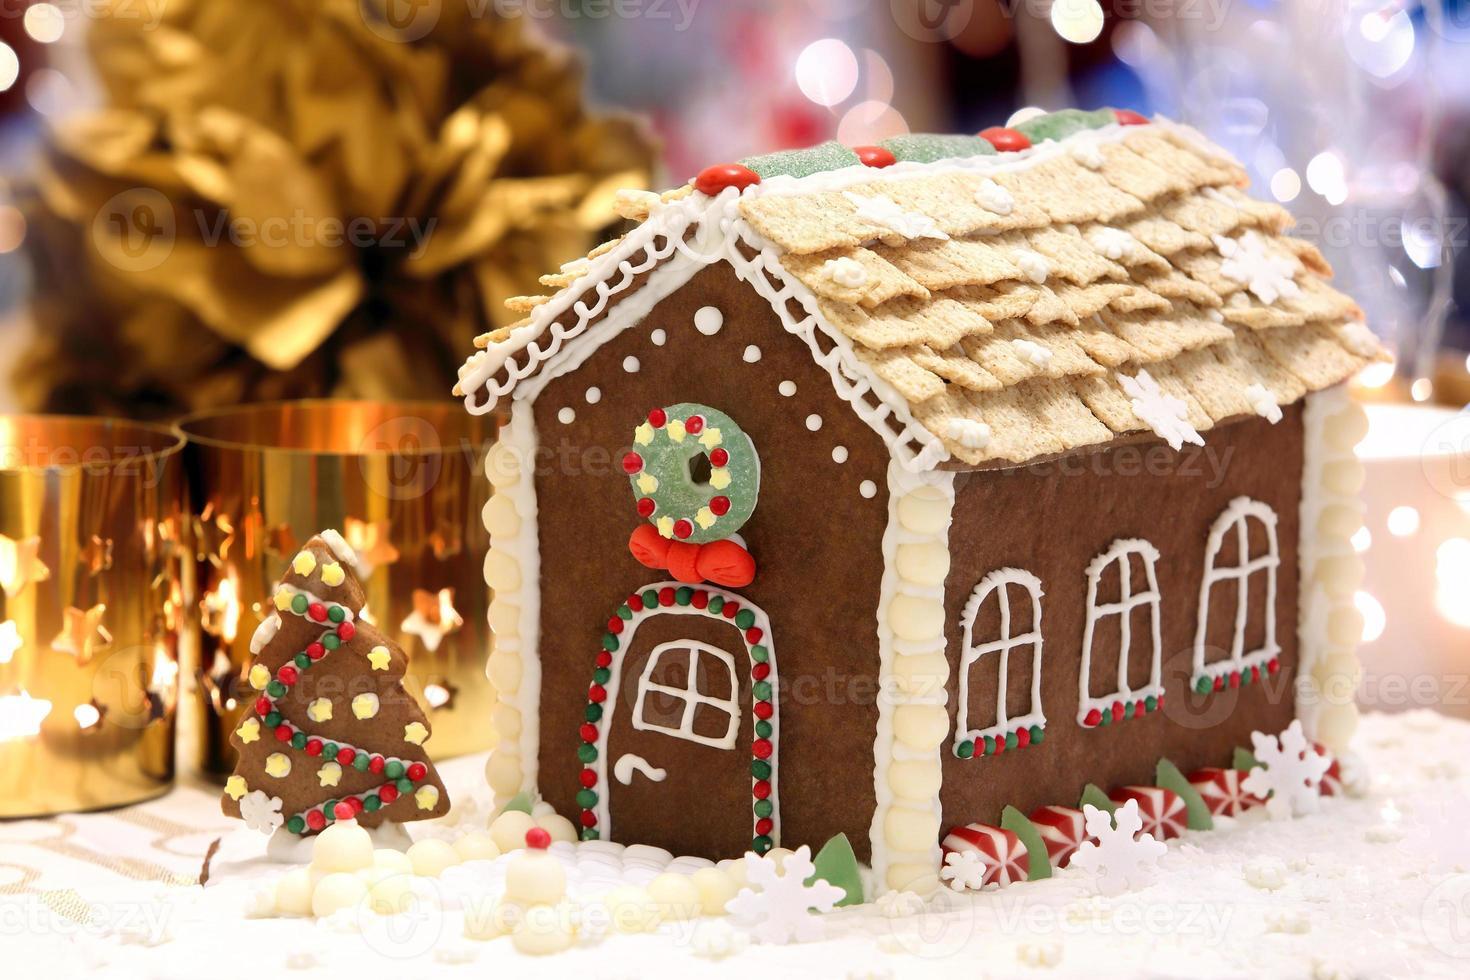 casa de pan de jengibre de navidad en la mesa decorada foto